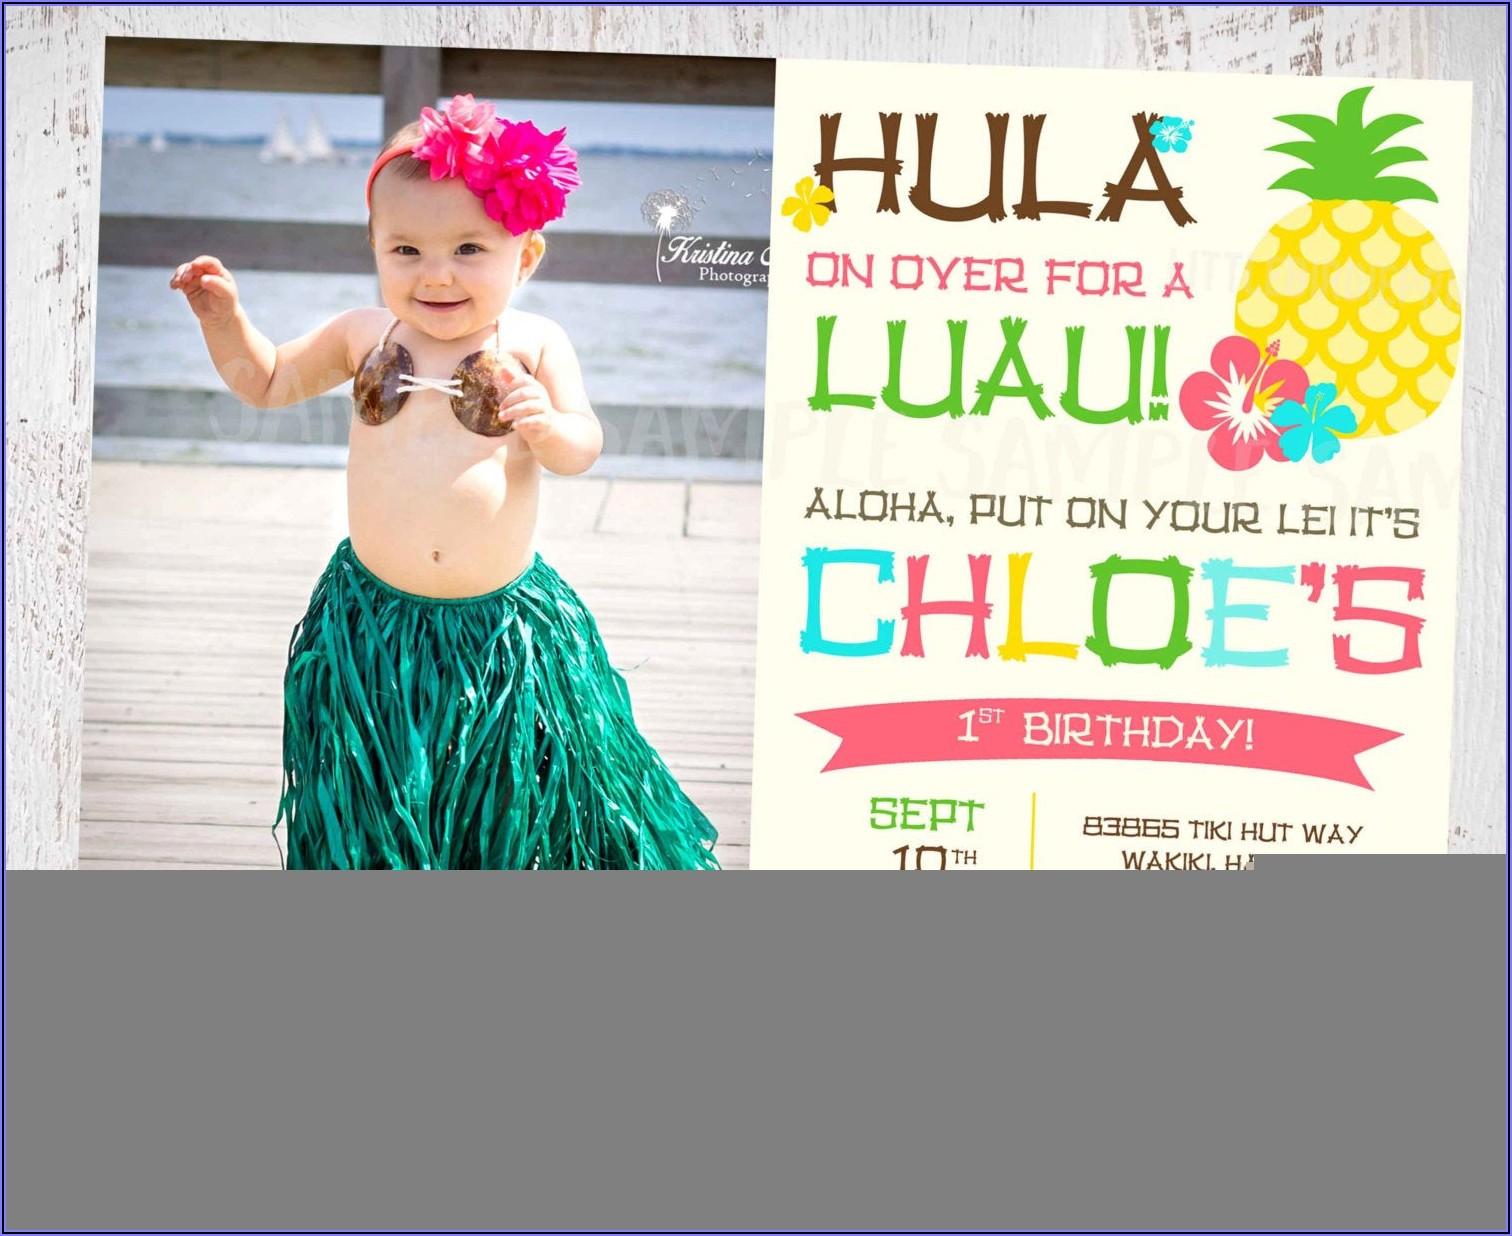 1st Birthday Luau Party Invitations